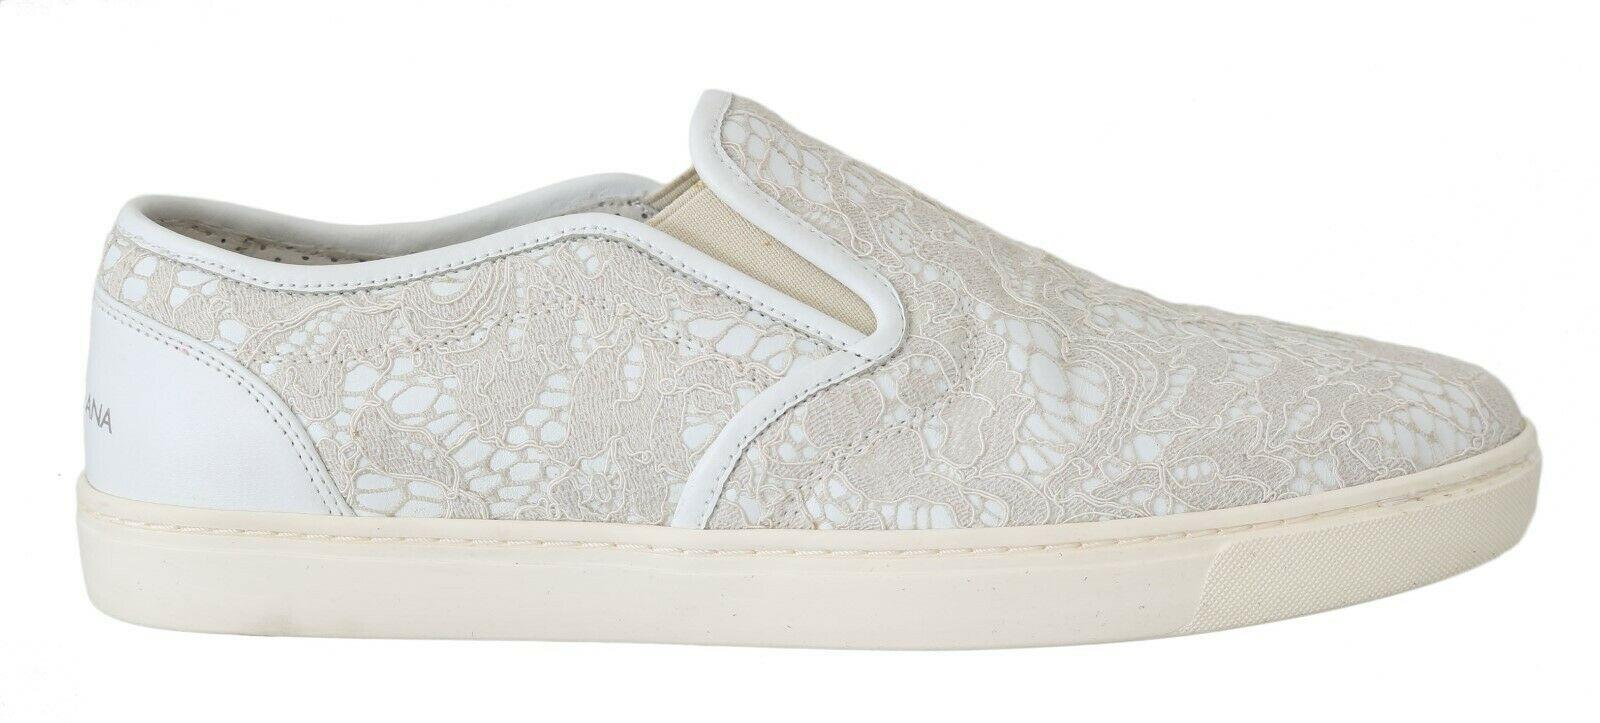 Dolce & Gabbana Women's Leather Lace Slip On Loafers White MV2257 - EU40/US9.5